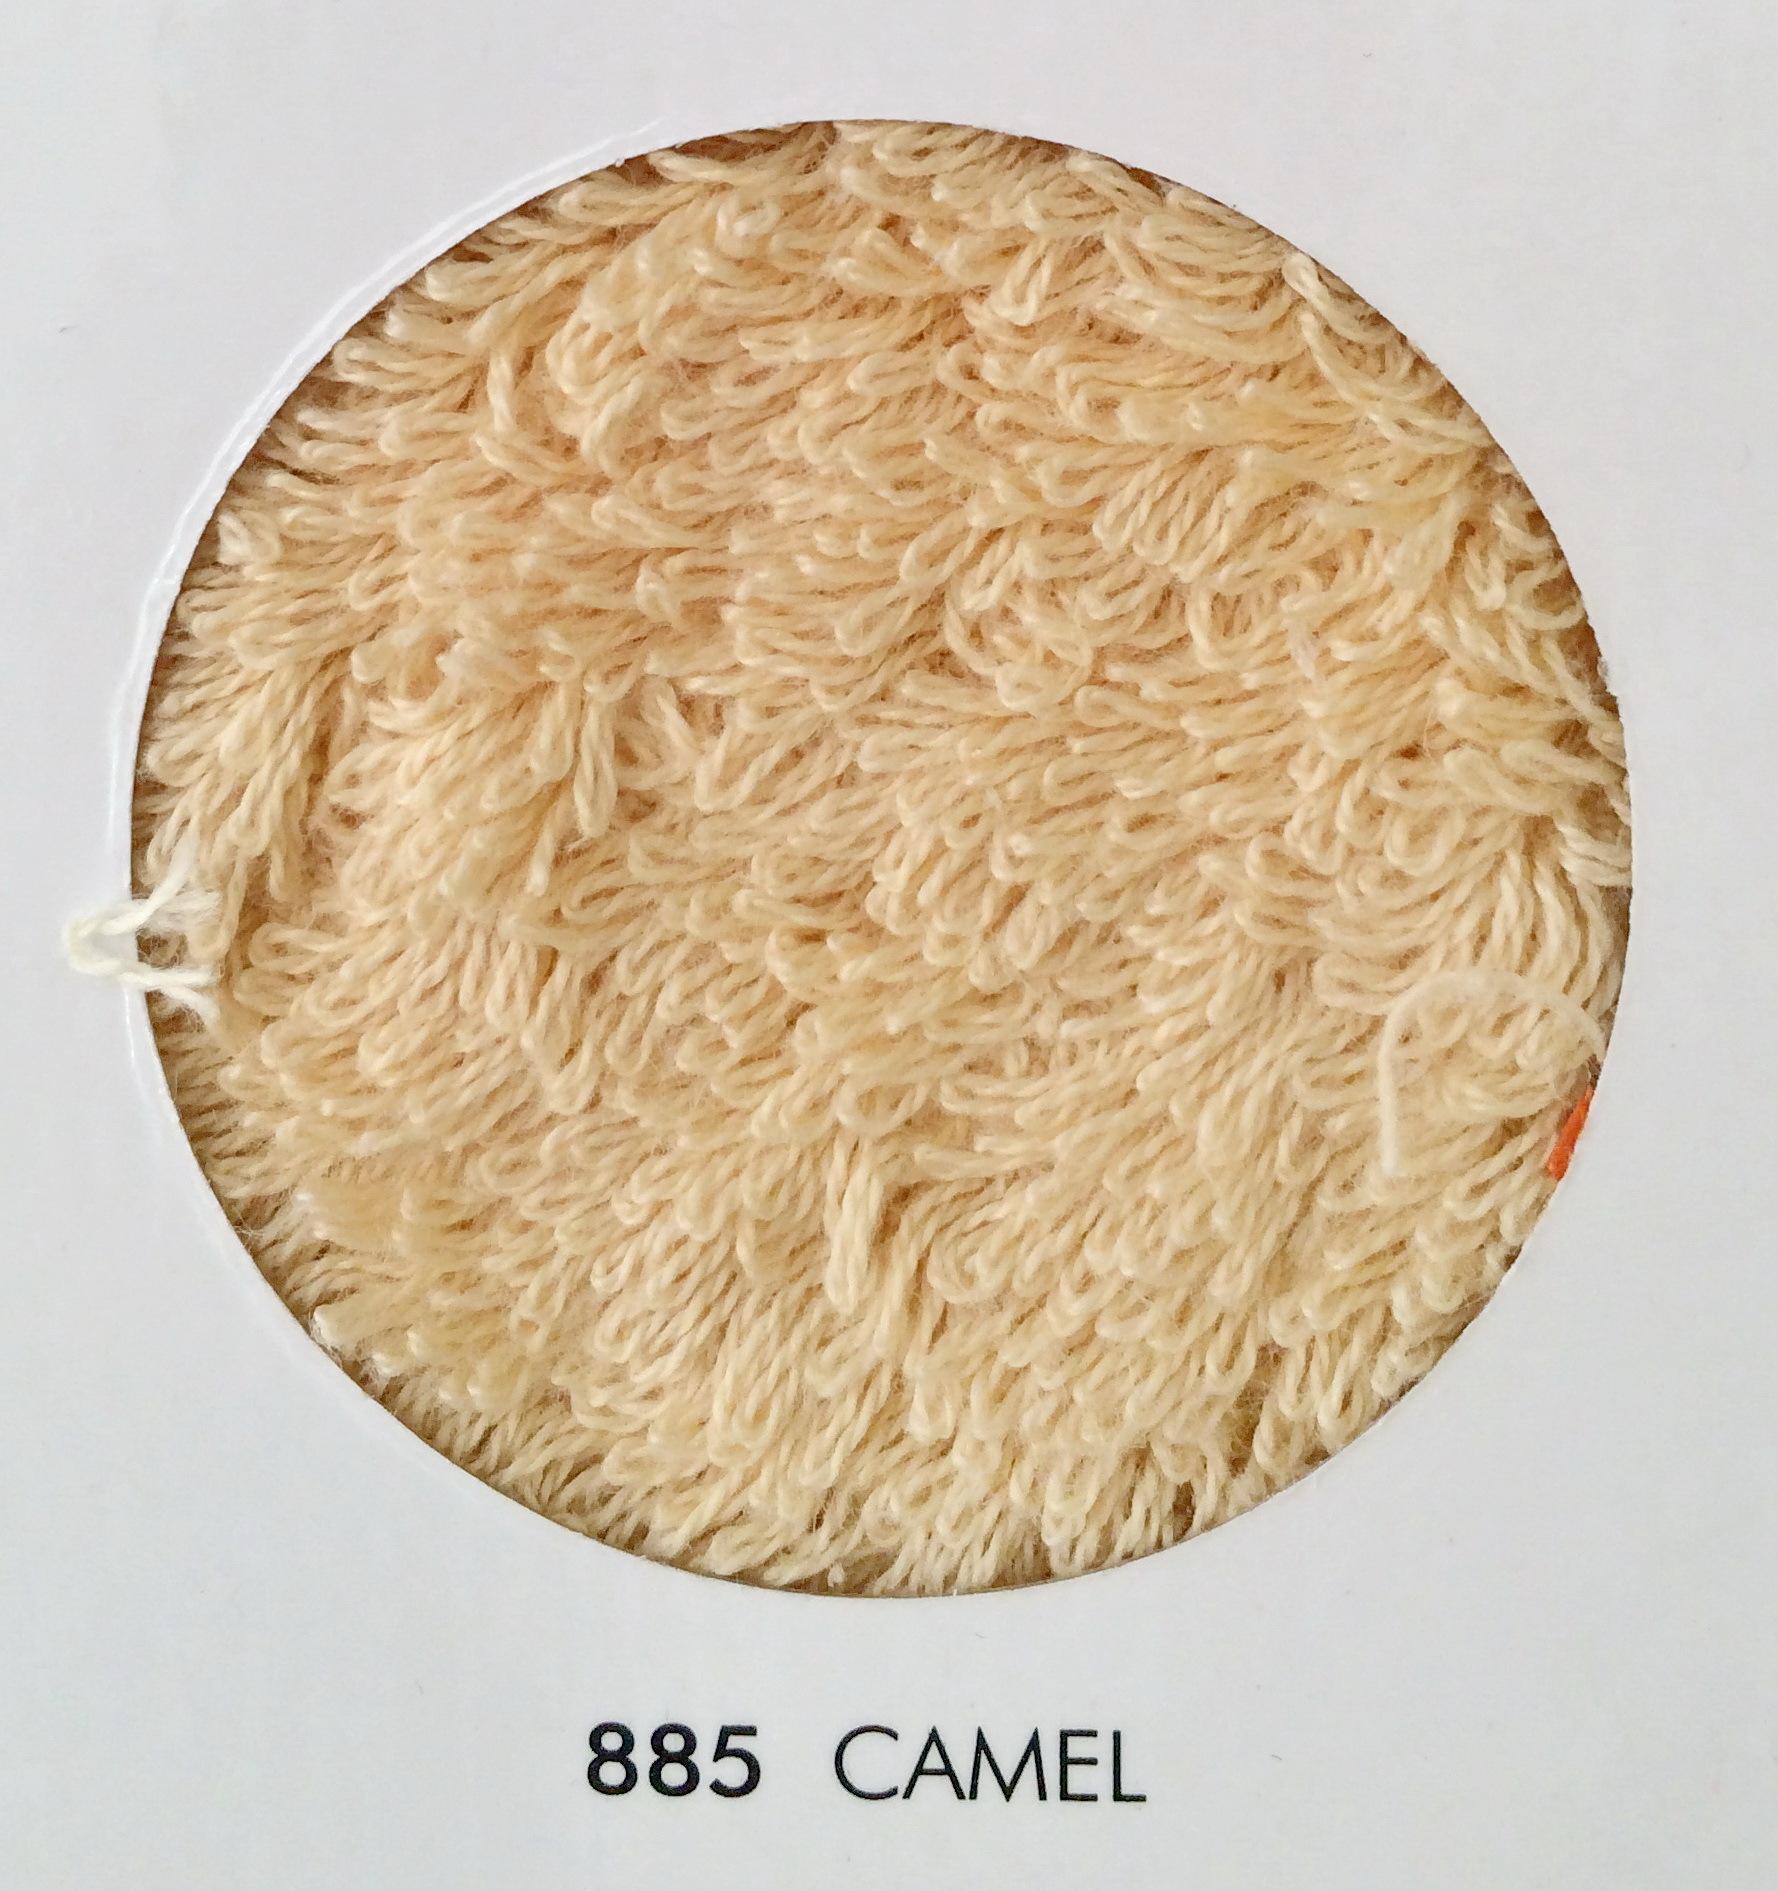 Коврики для ванной Коврик для ванной 50х80 Abyss & Habidecor Must 885 Camel elitnyy-kovrik-dlya-vannoy-must-885-camel-ot-abyss-habidecor-portugaliya-vid.jpg